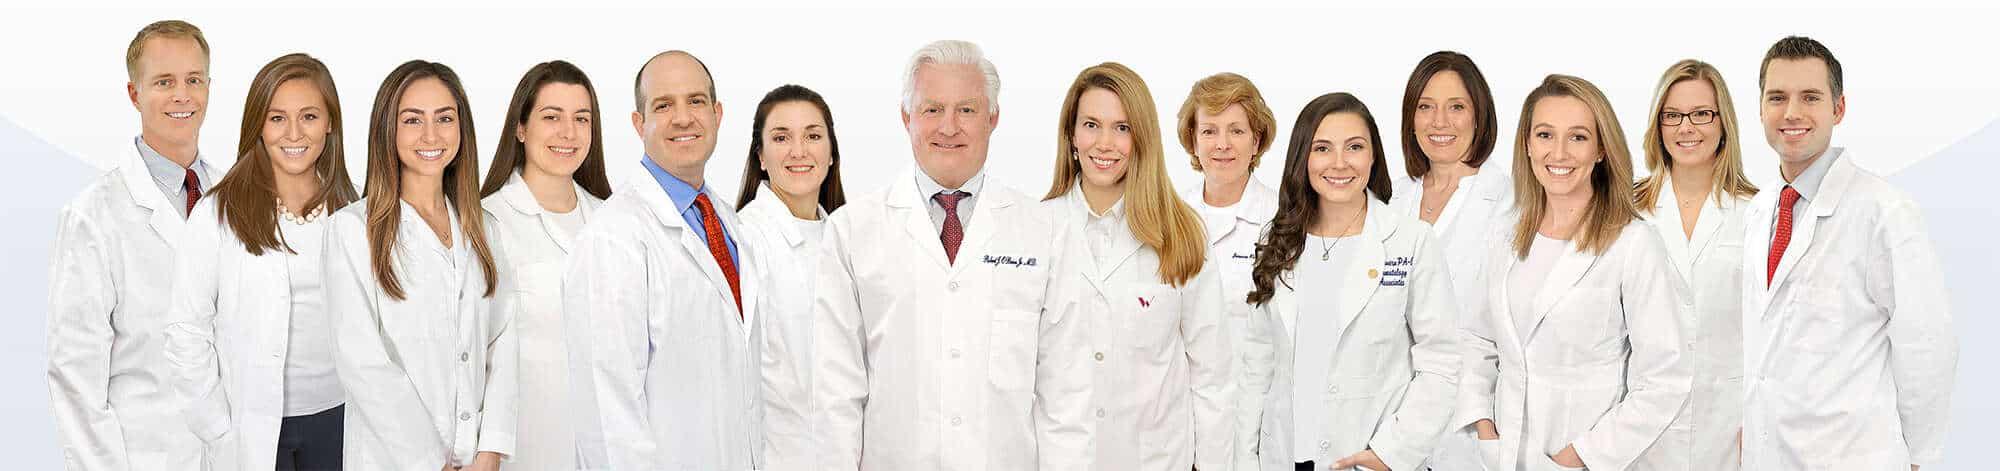 Dermatology Associates of Winchester